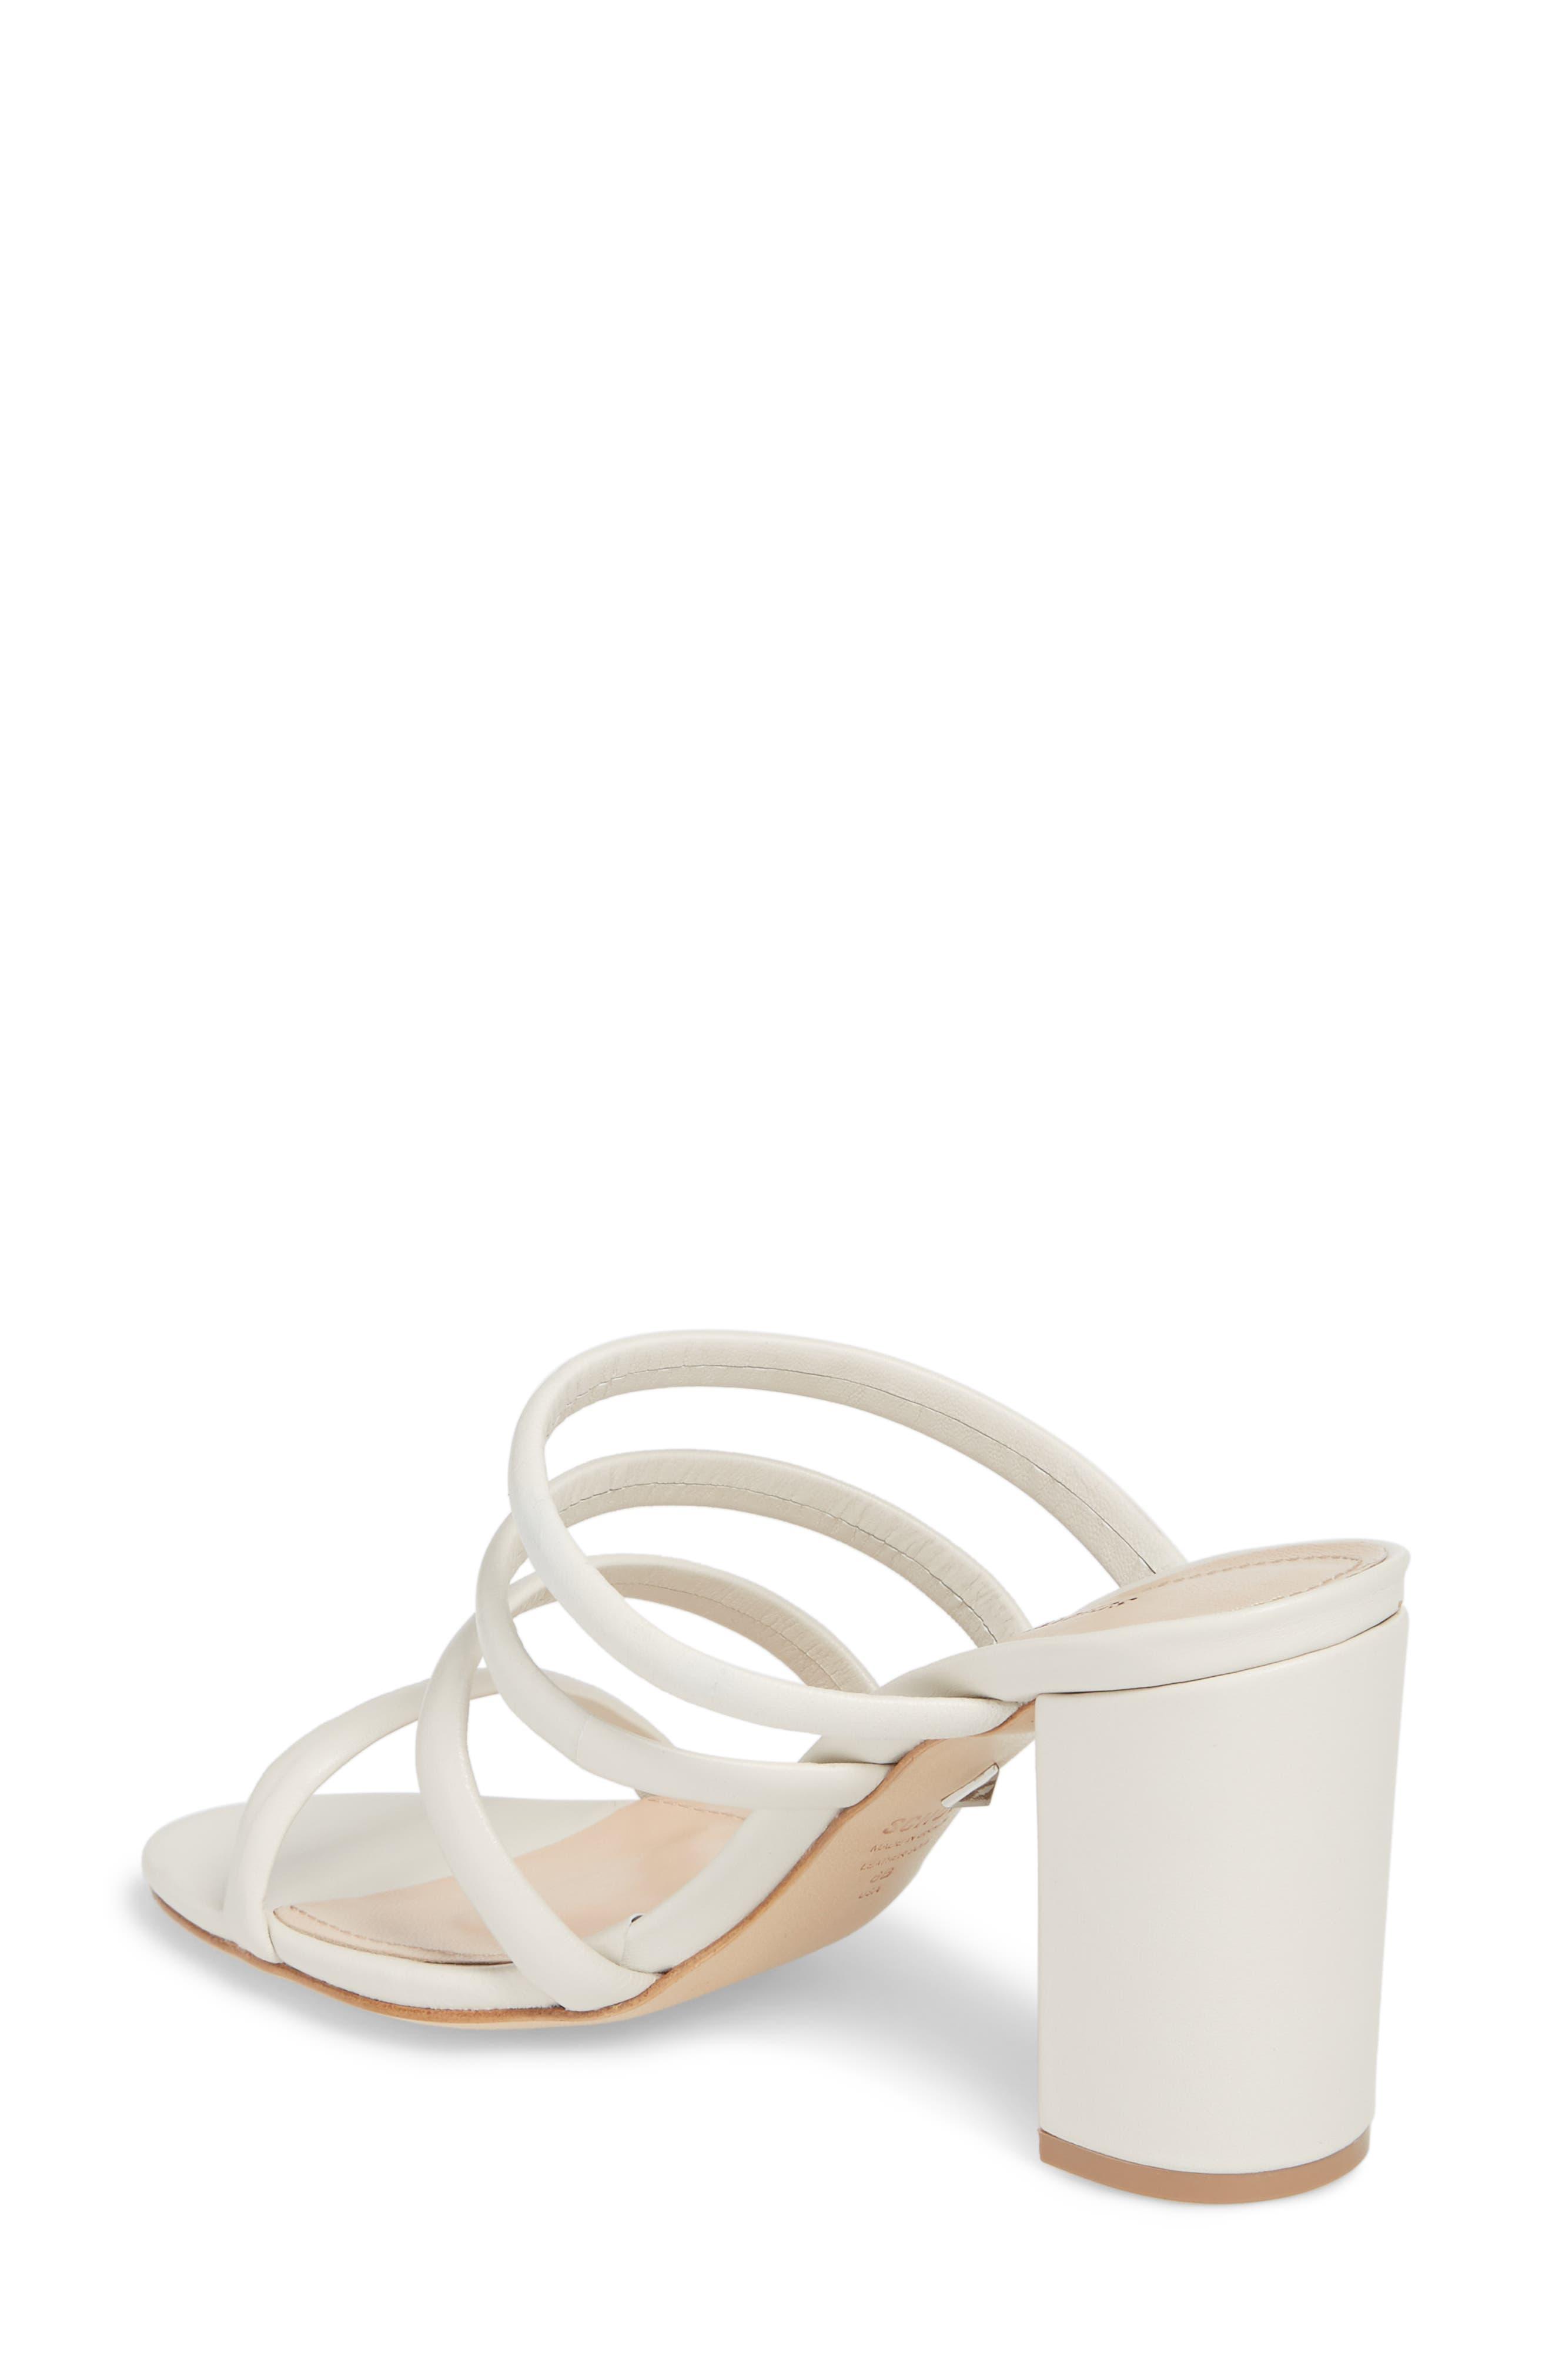 Felisa Block Heel Sandal,                             Alternate thumbnail 2, color,                             100